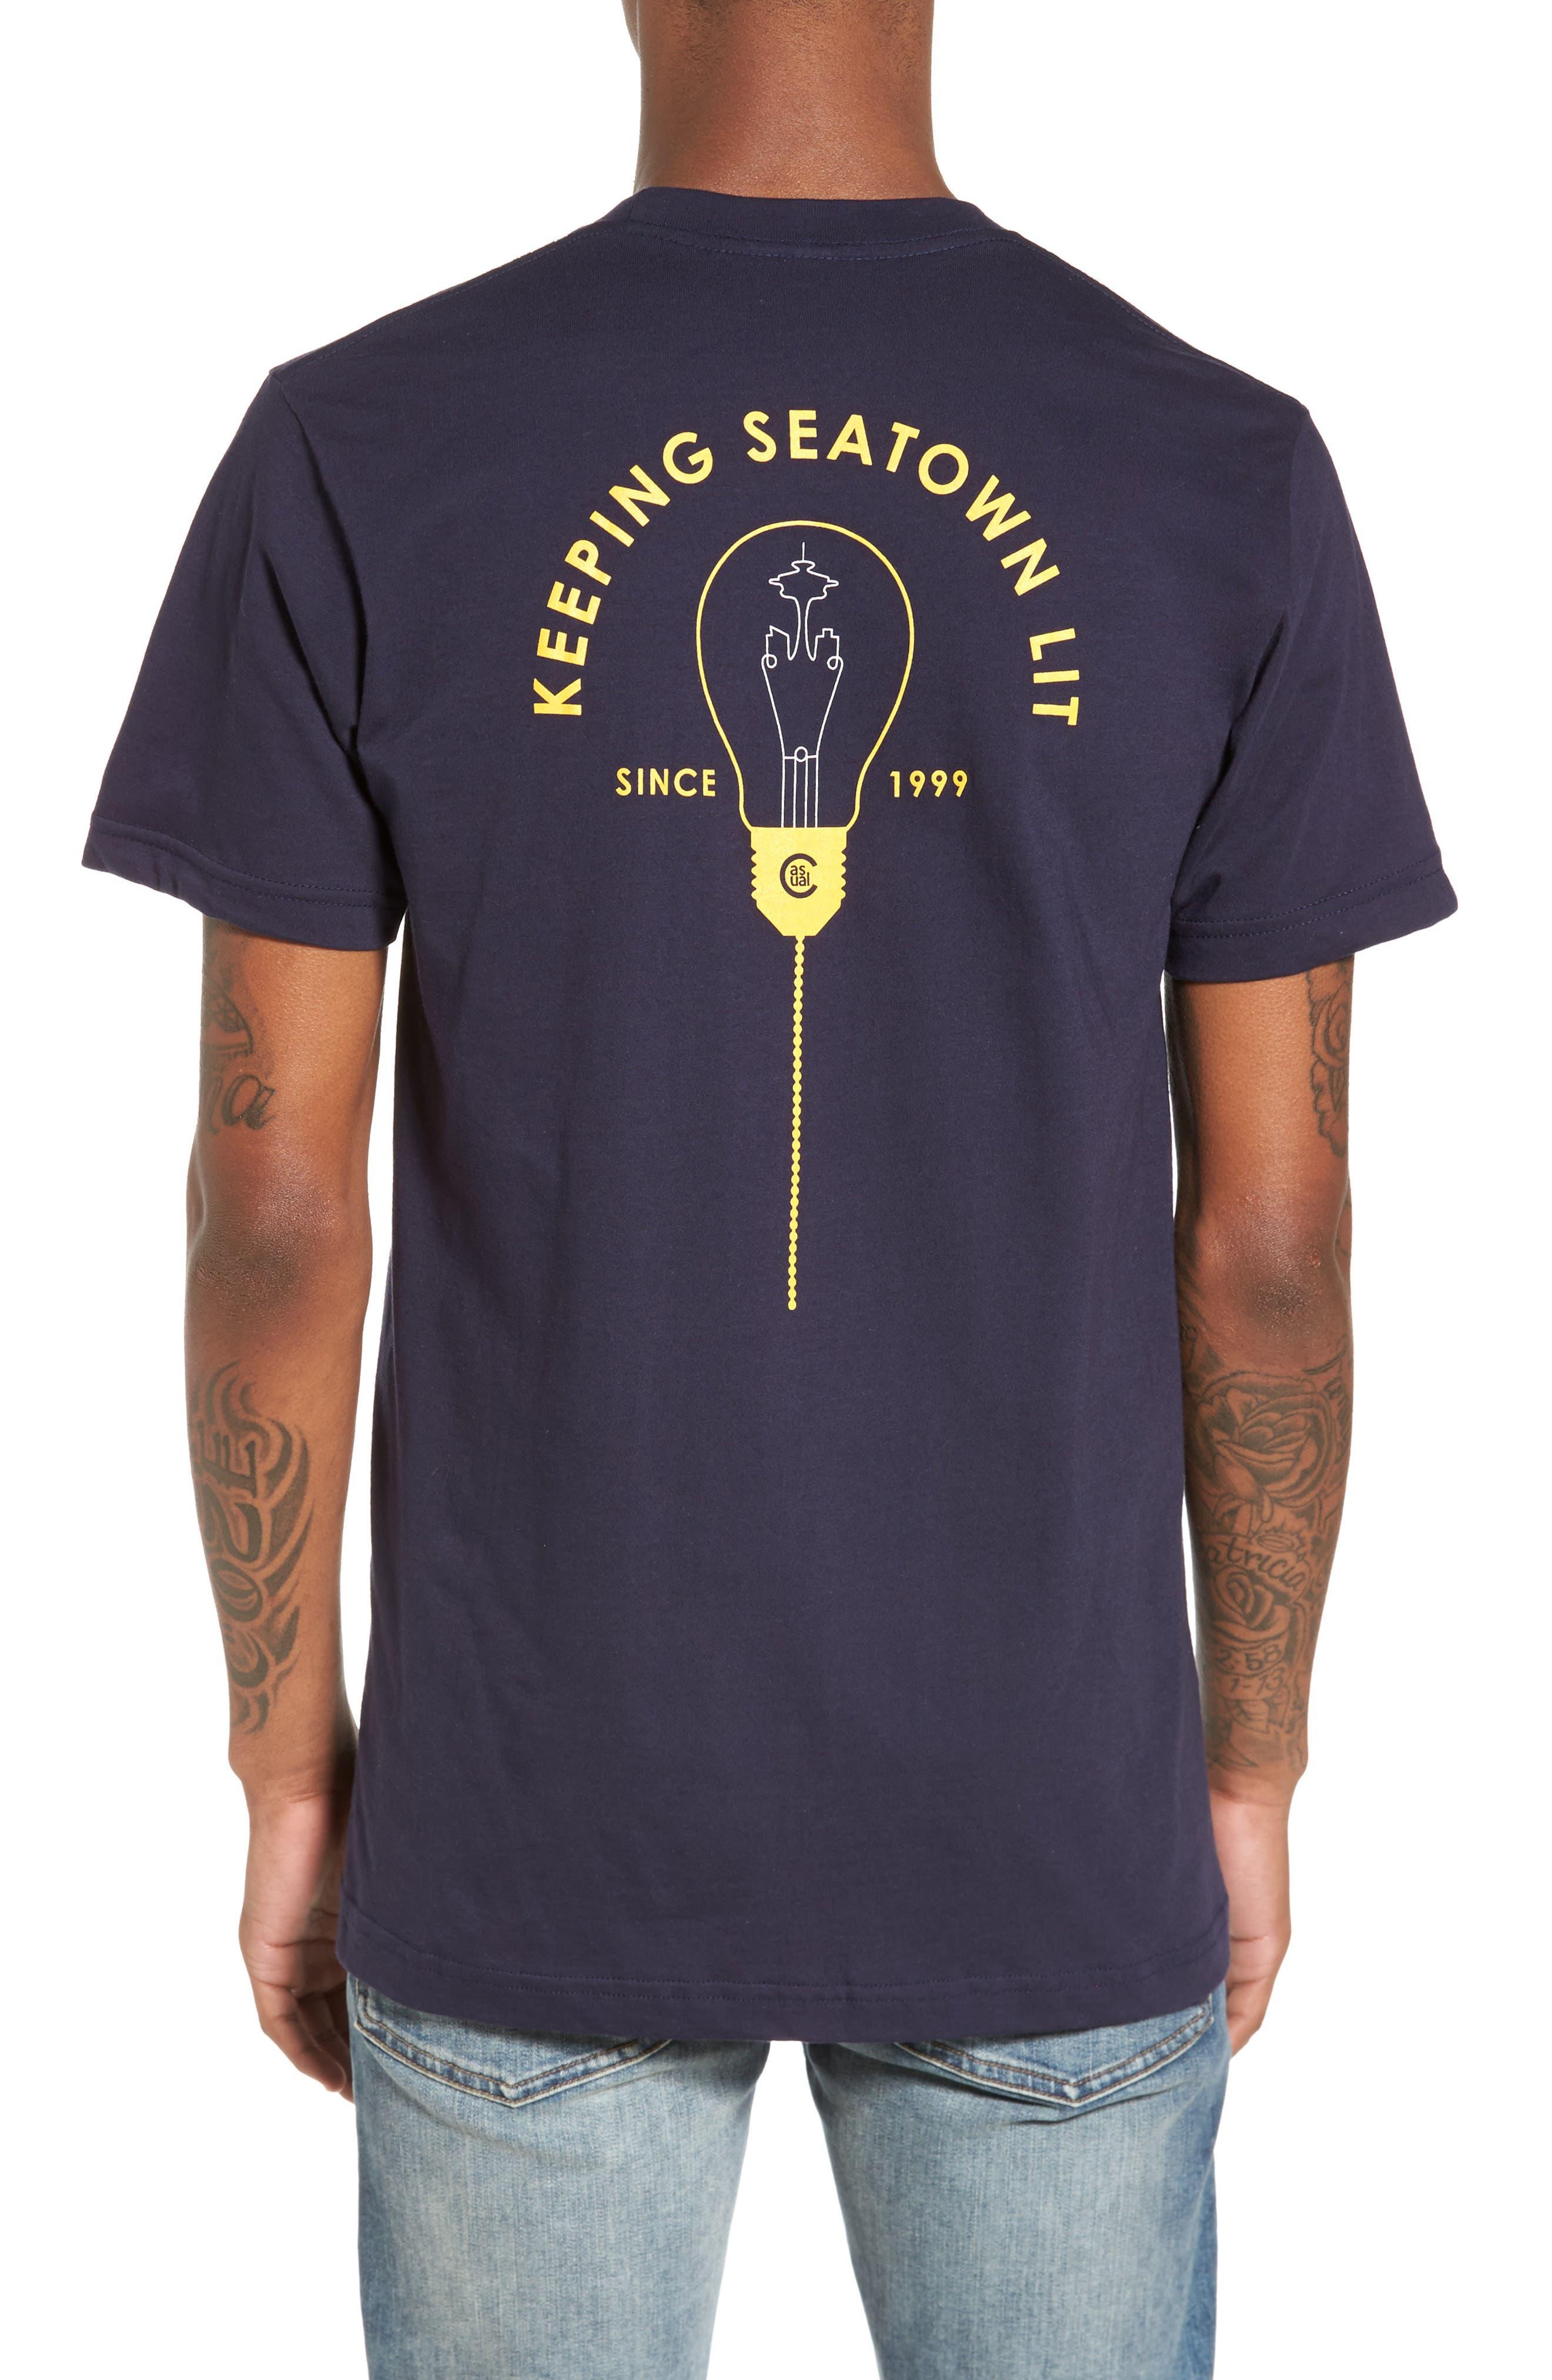 Keeping Seatown Lit T-Shirt,                             Alternate thumbnail 2, color,                             400